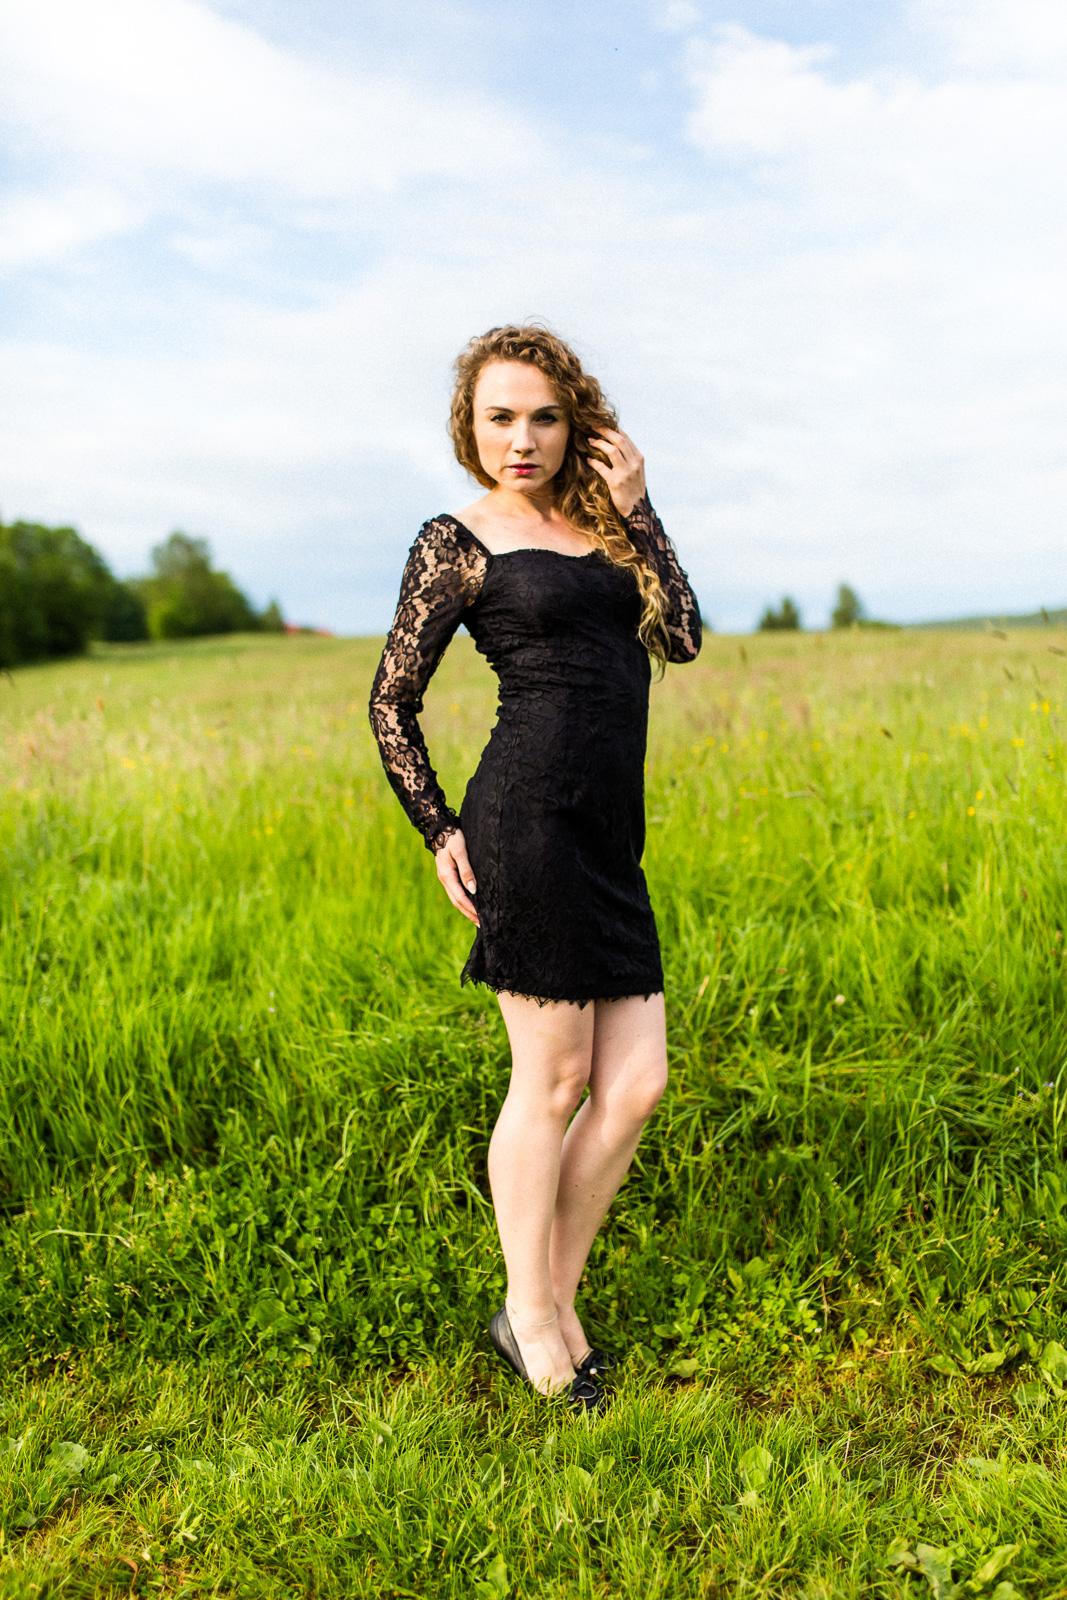 Christin im Kleid in der Natur - Boudoir Christin im Sessel - Akt Erotik Boudoir Fotograf sexy Homeshooting nackt